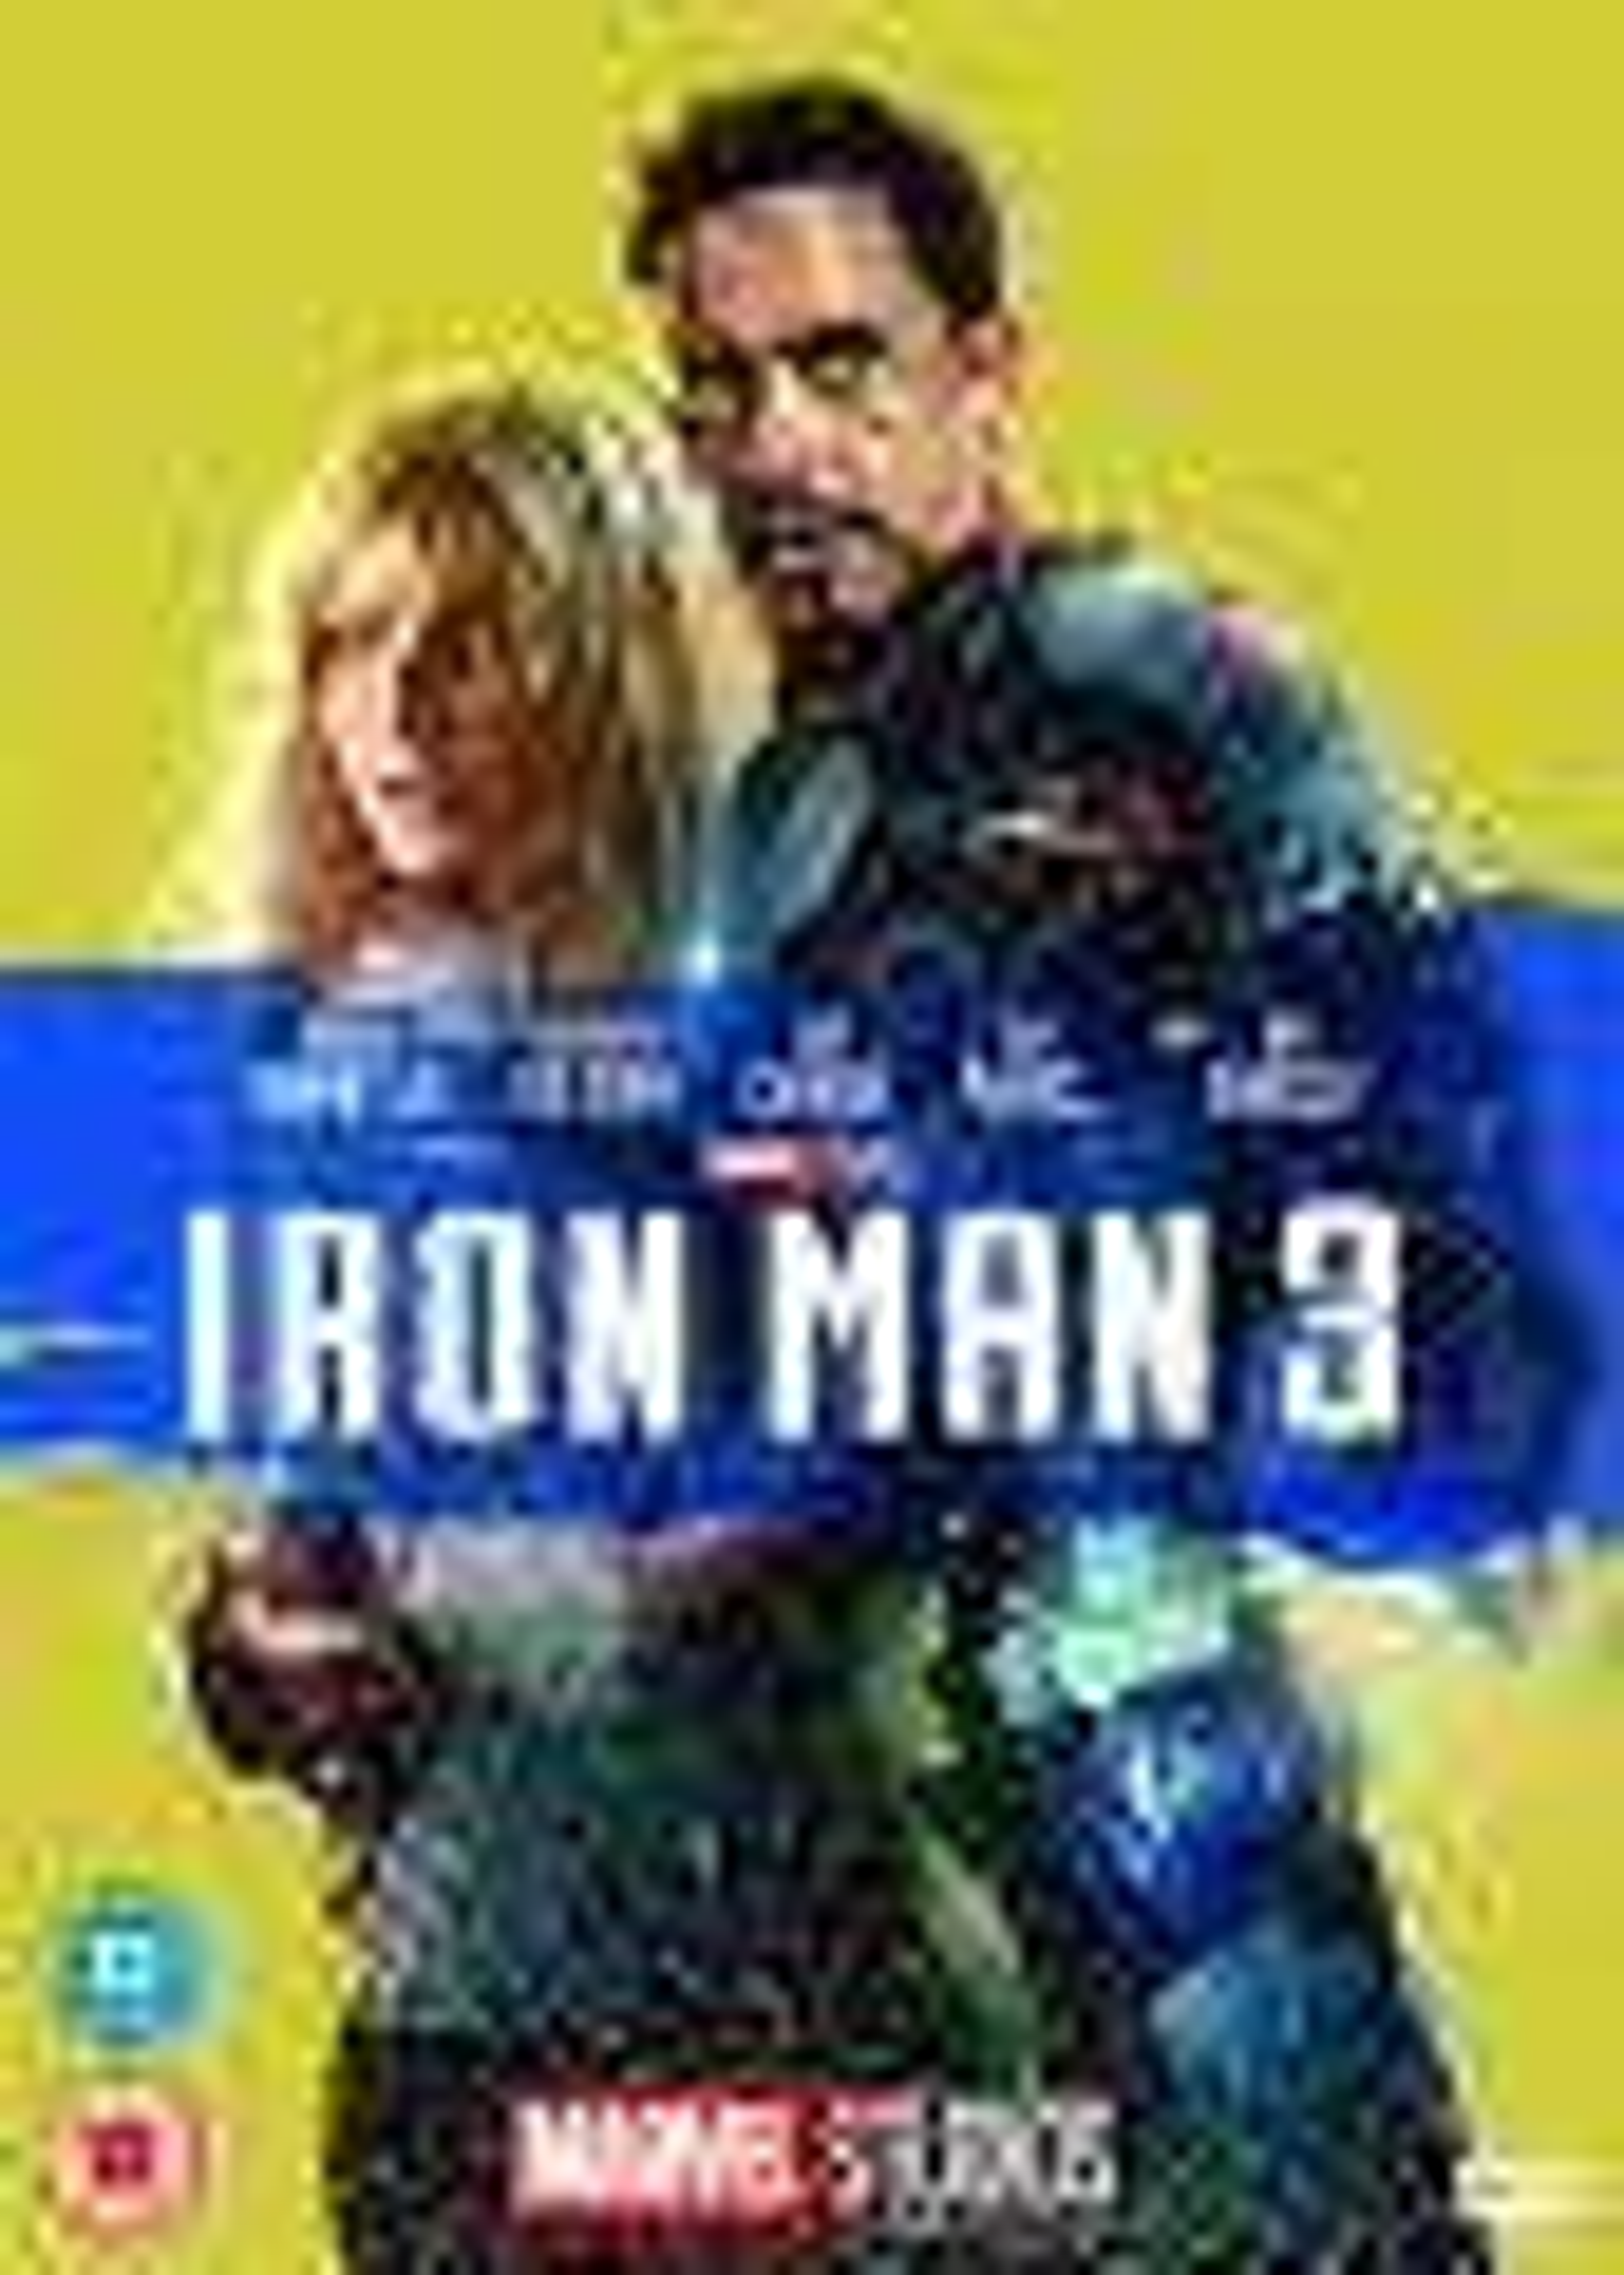 Marvel Cinematic Universe film 7 - Iron Man 3